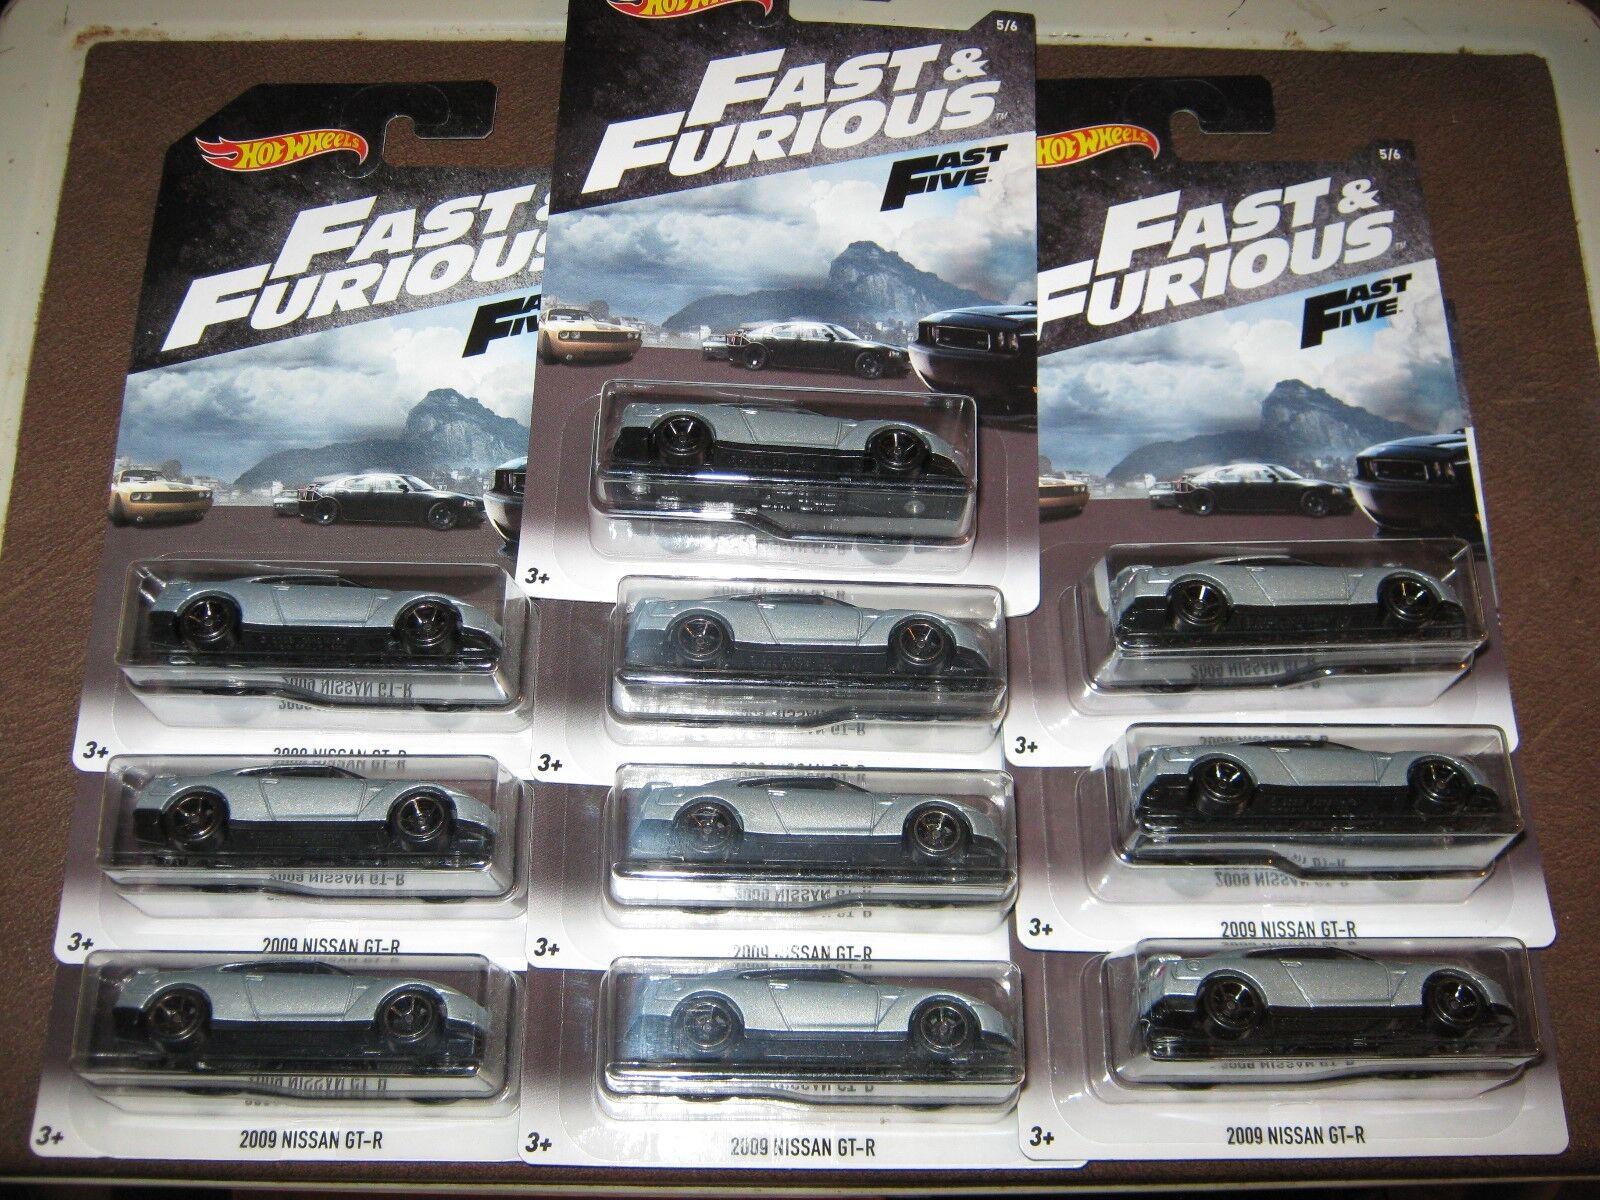 ganancia cero Lote de 10 = 2018 Hot Wheels Fast & Furioso Furioso Furioso = = 2009 JDM Nissan GT-R ='09  en stock